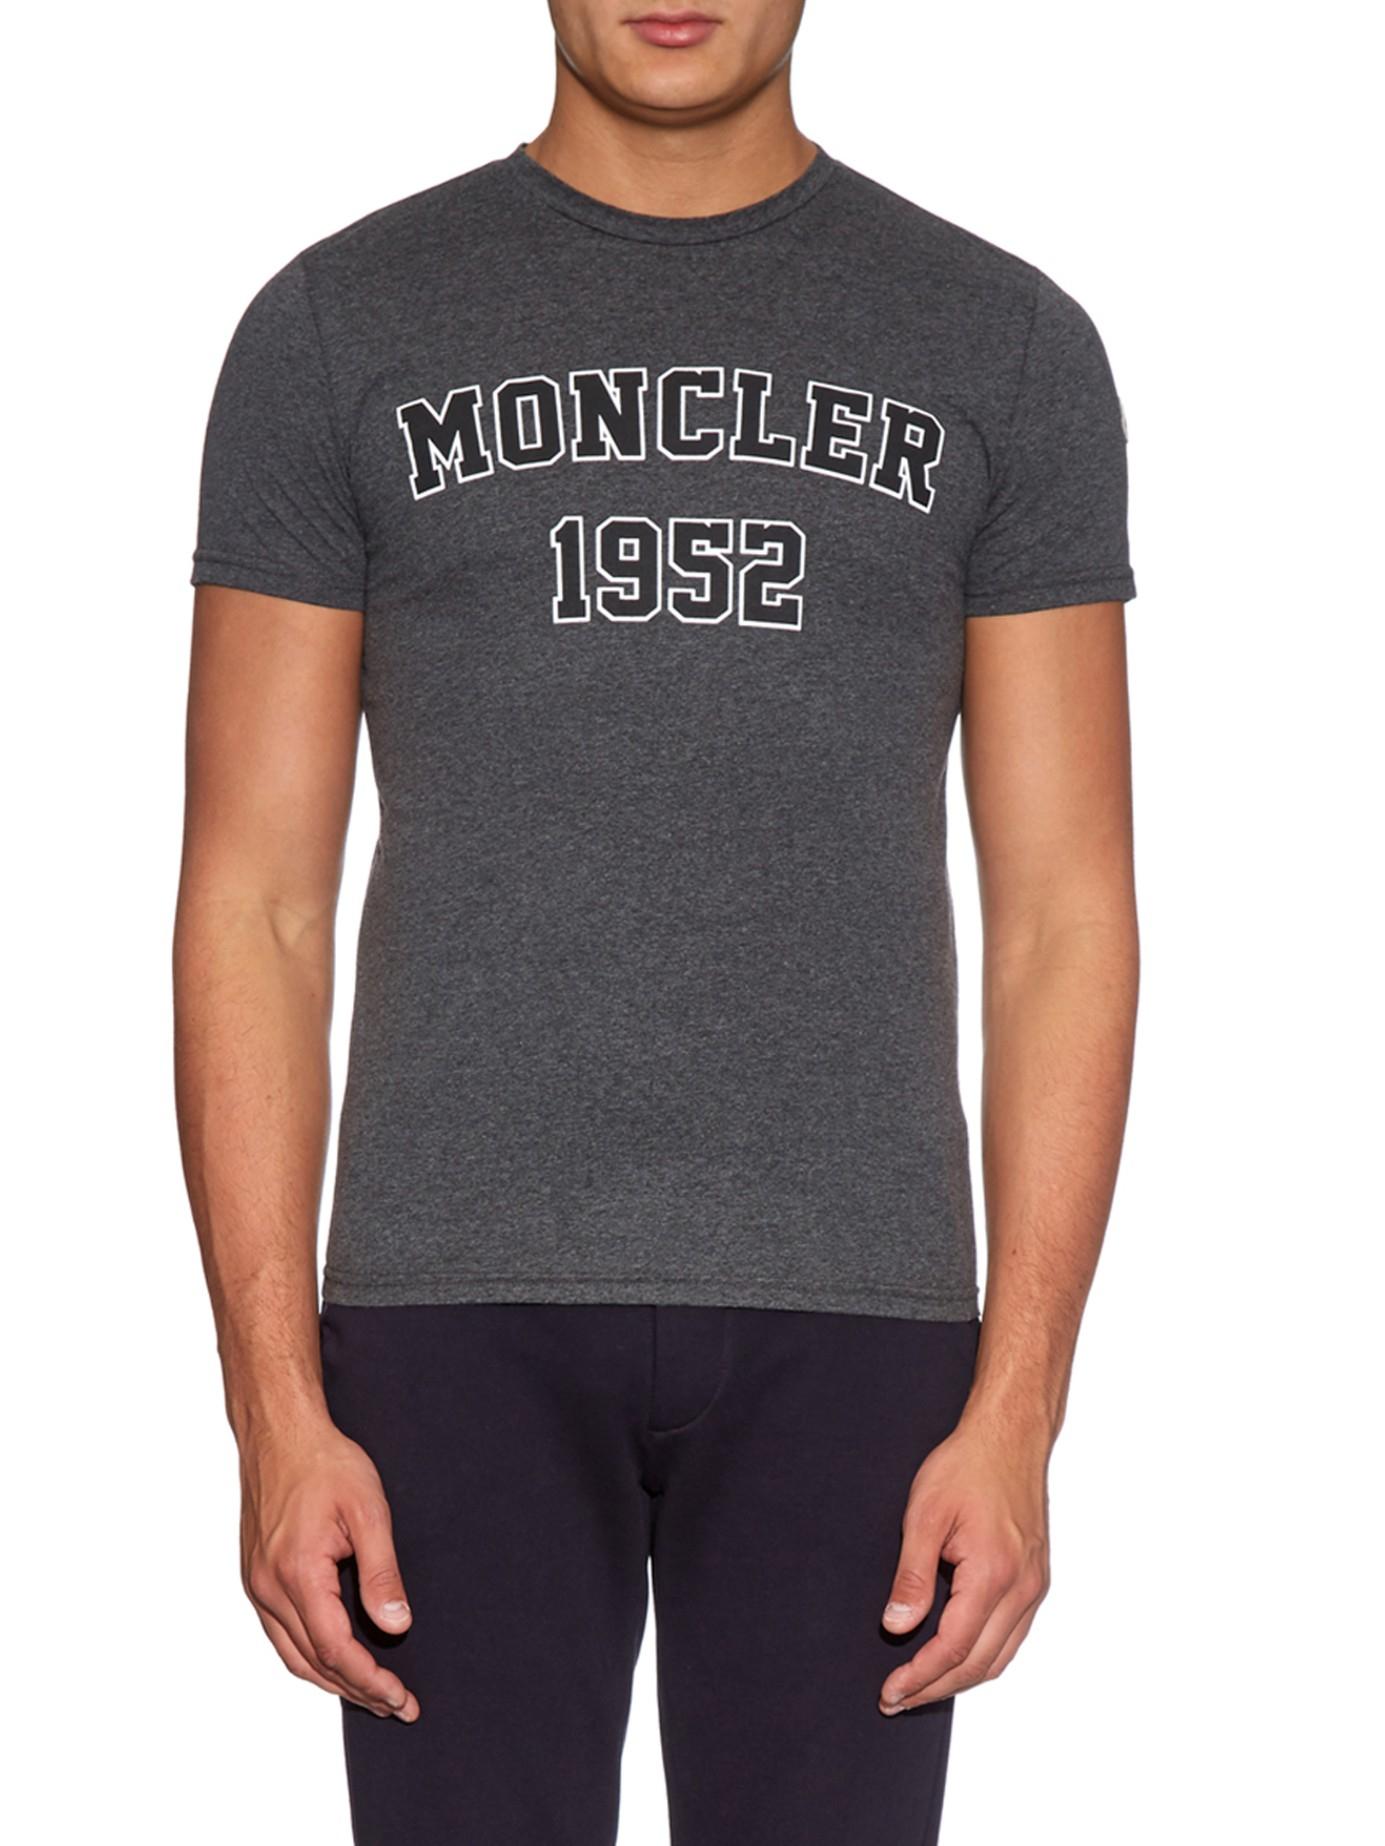 469053b1b251 Lyst - Moncler 1952 Logo-print Jersey T-shirt in Gray for Men